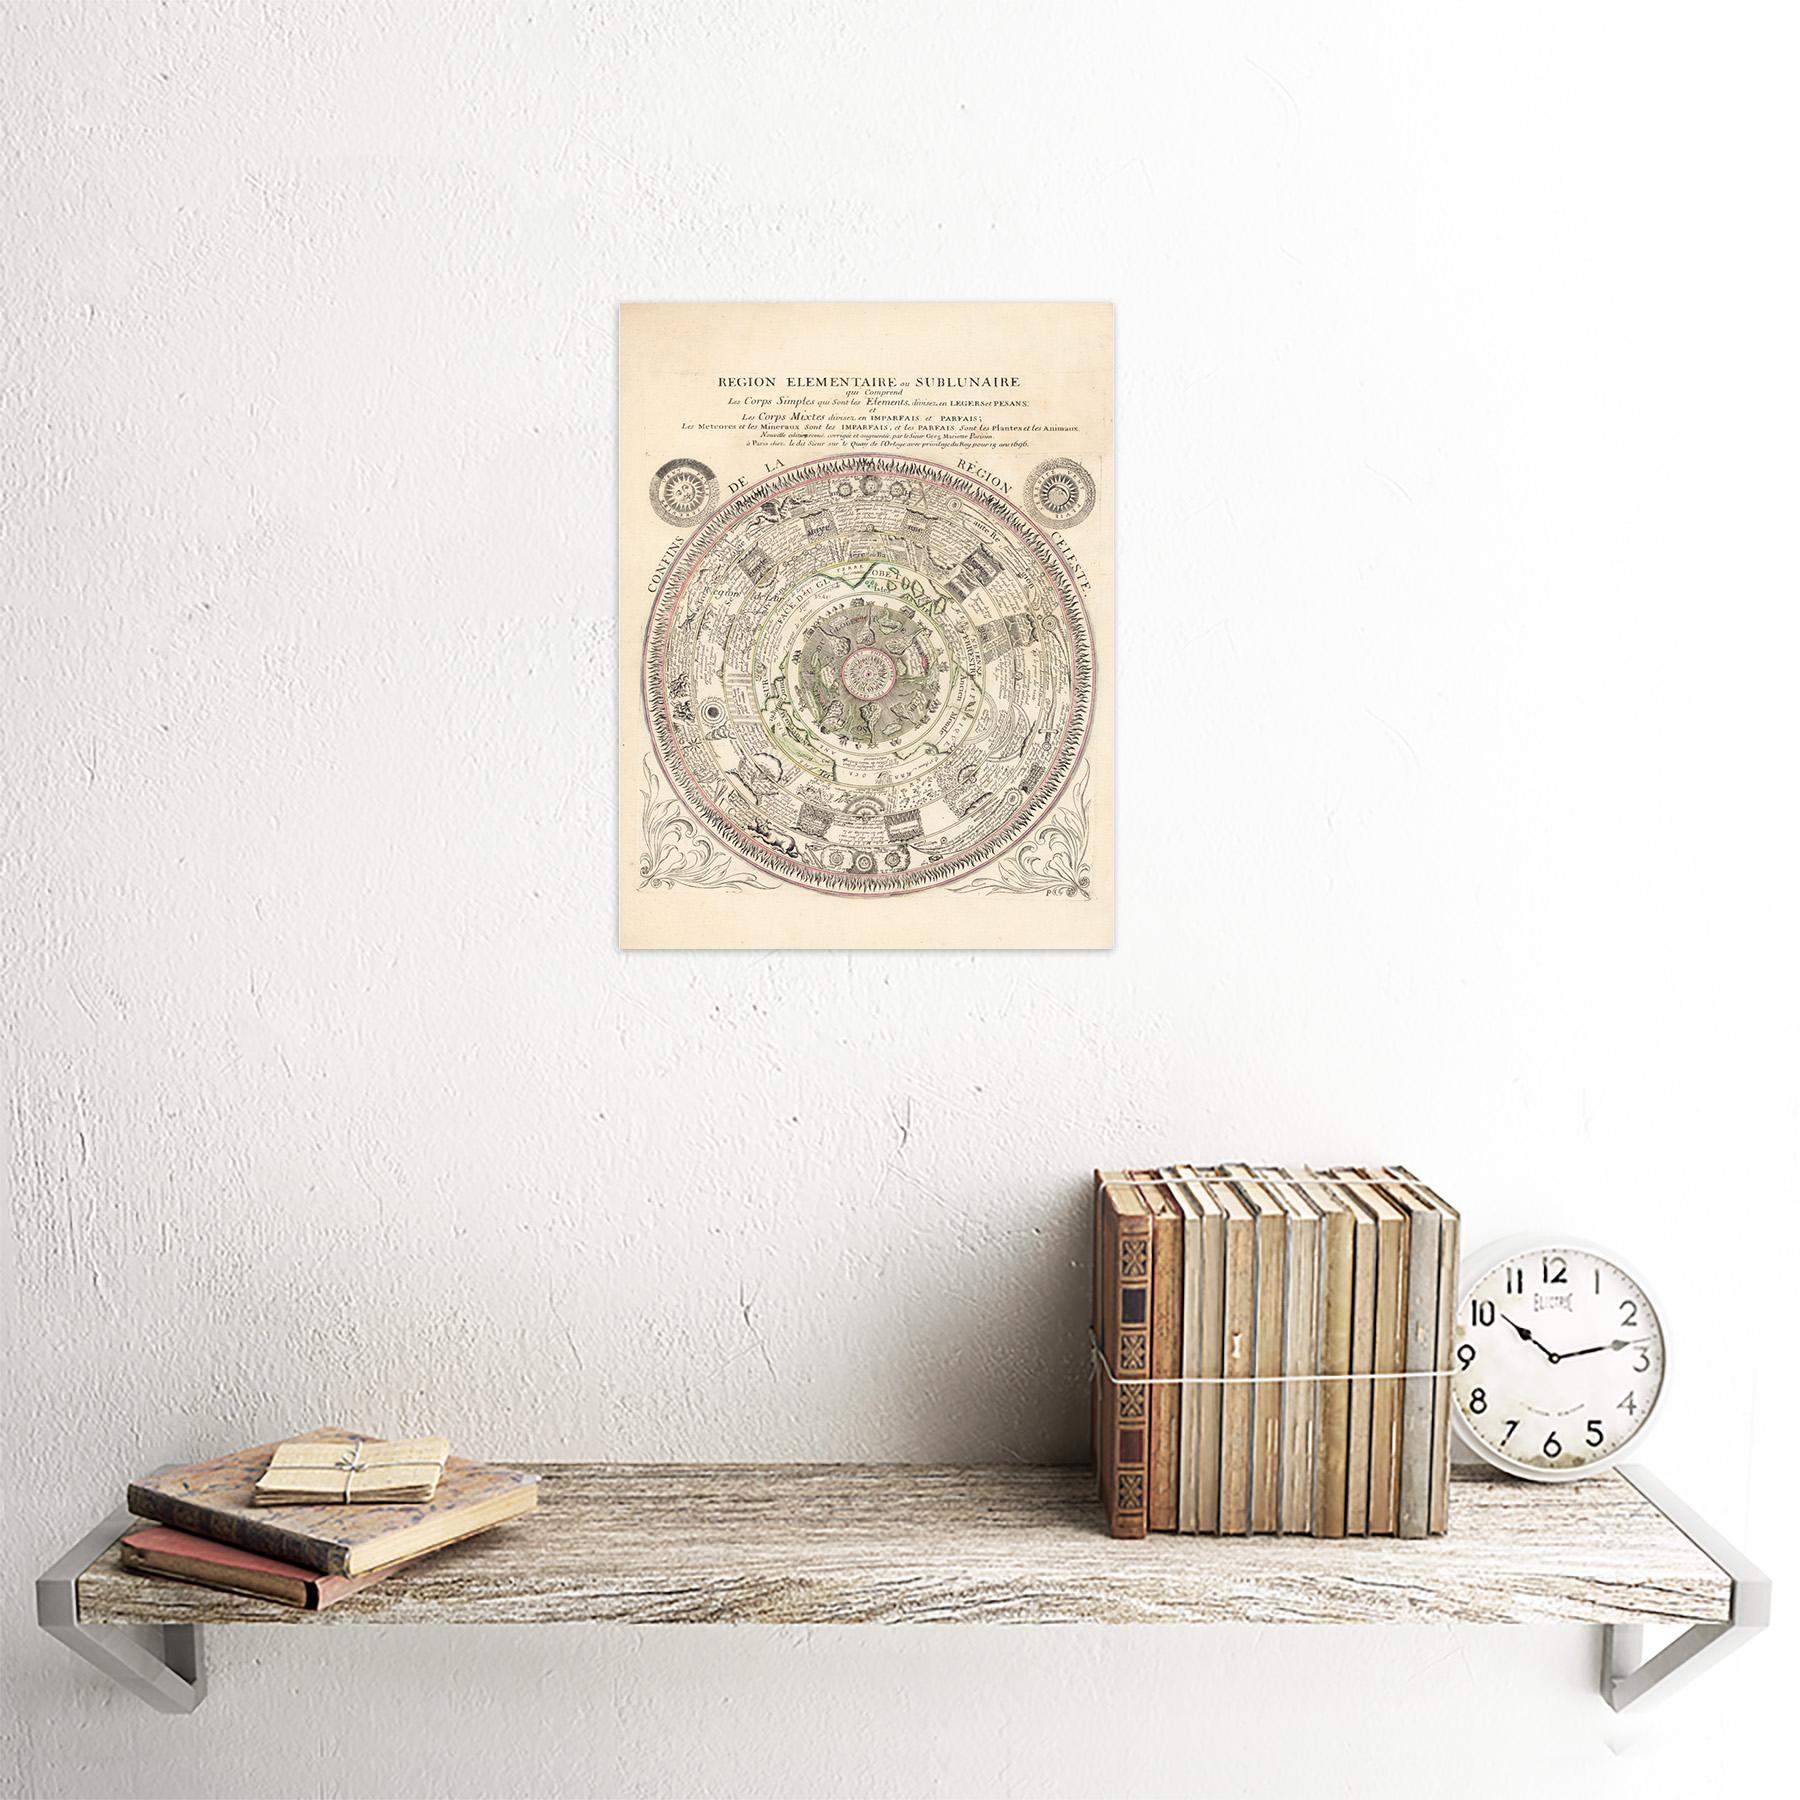 Mapa Mariette 1696 Celeste ptolemaico Gráfico pared arte impresión enmarcado 12x16